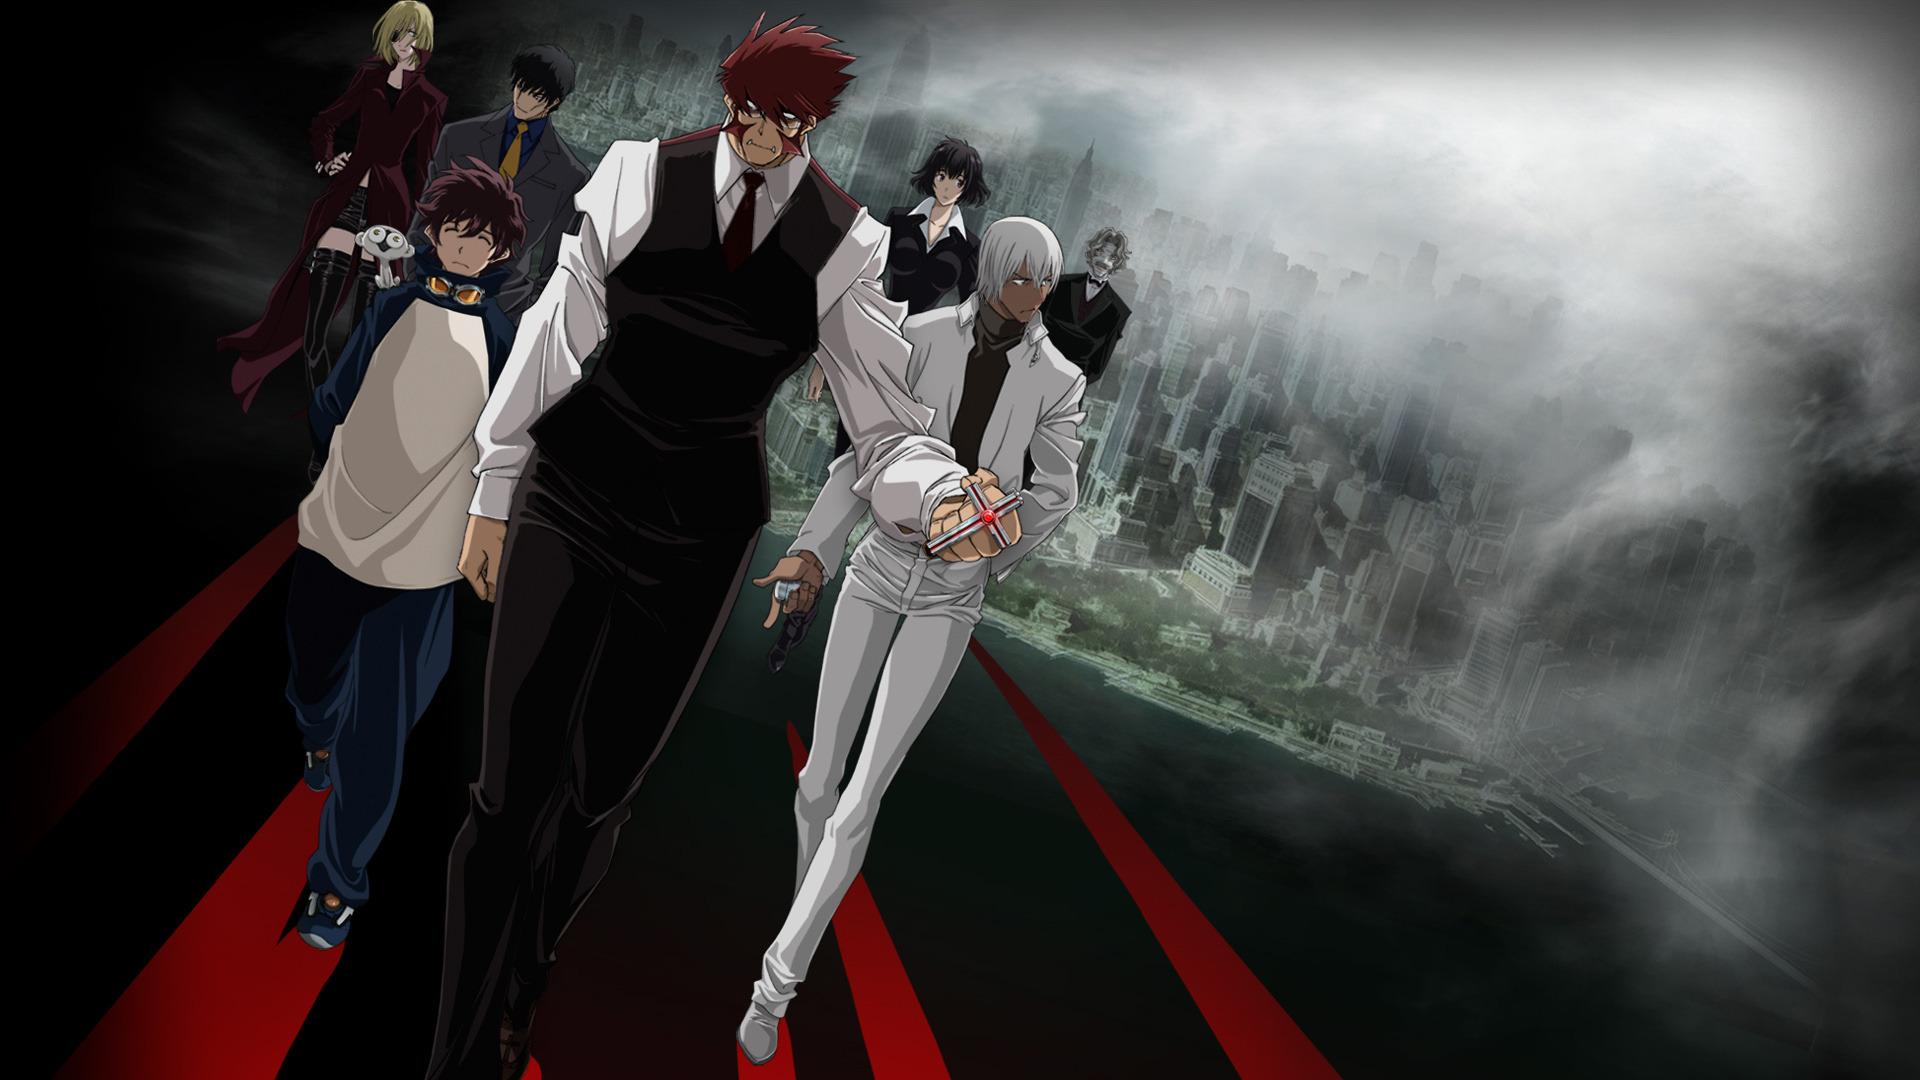 Anime Kekkai Sensen